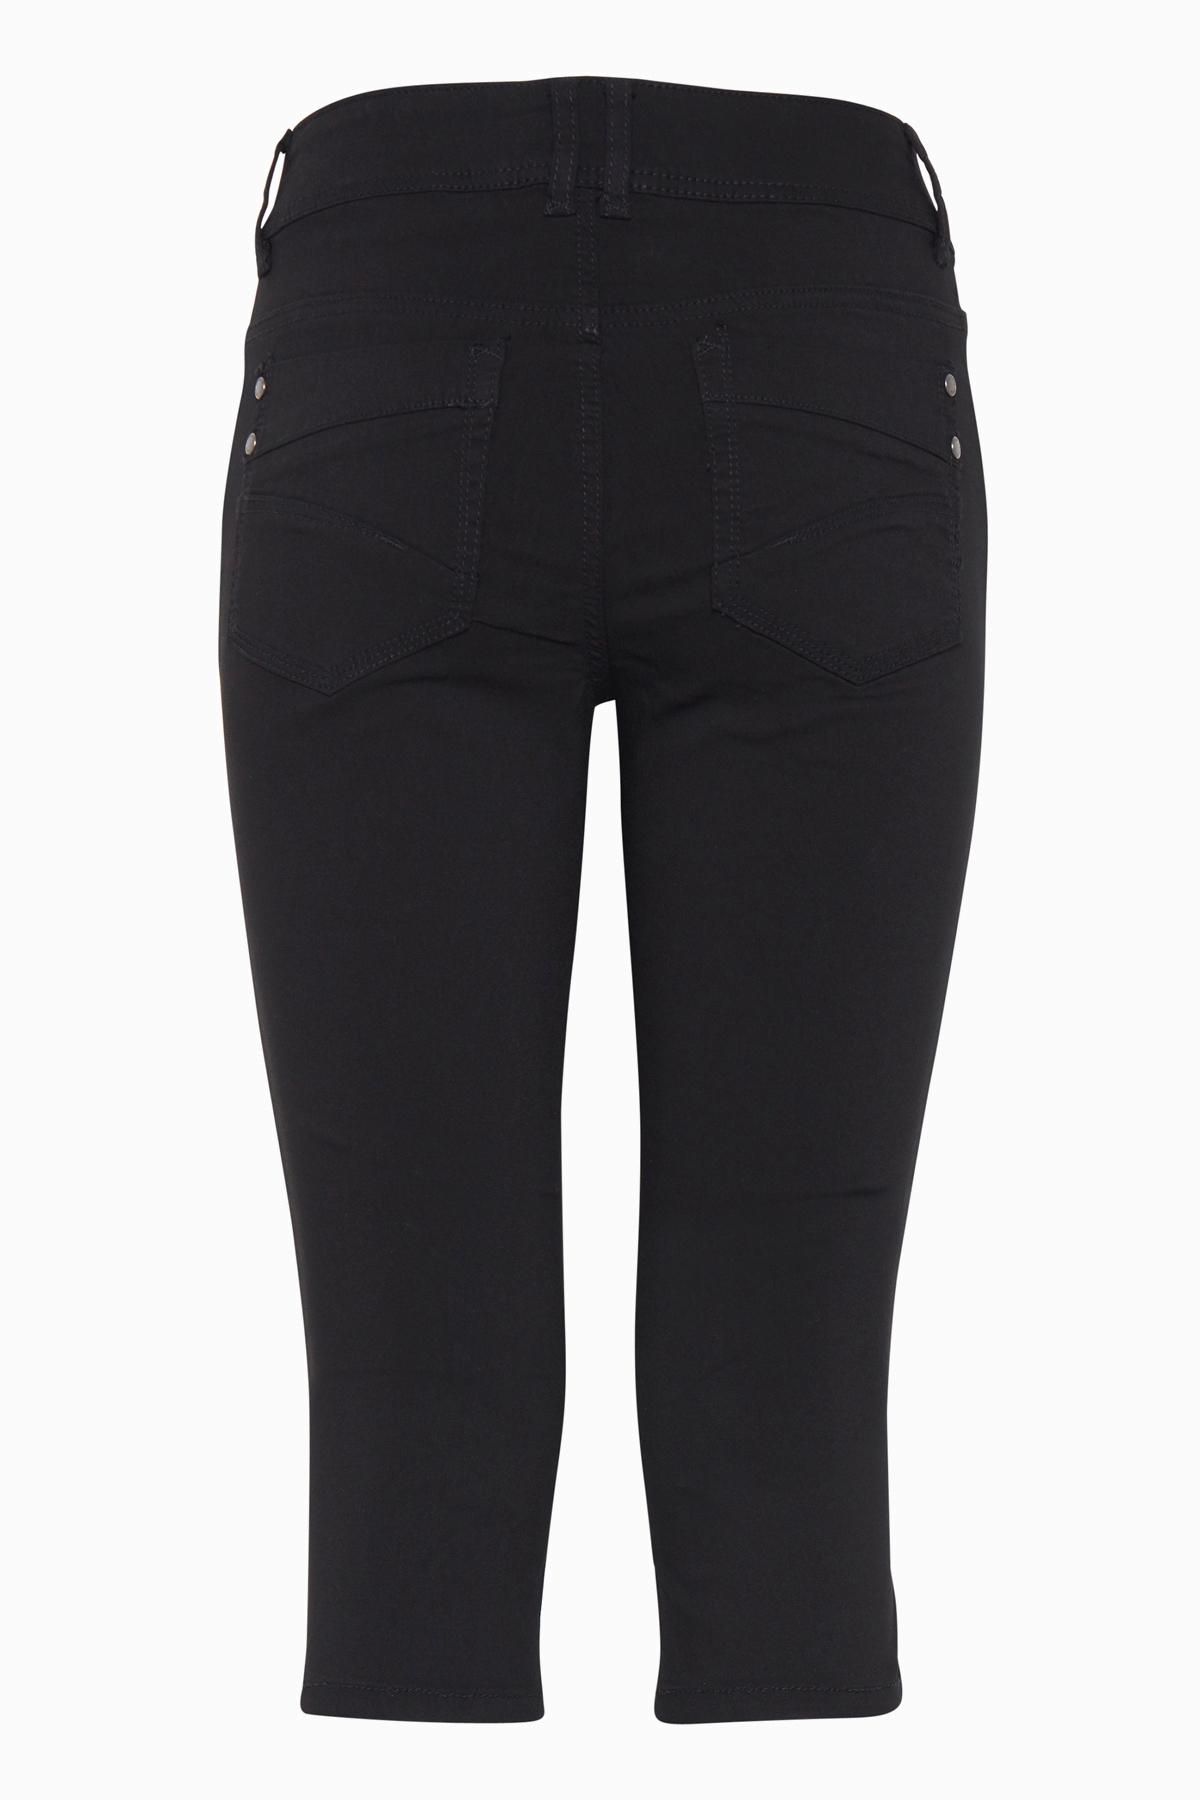 Sort Casual bukser fra Fransa – Køb Sort Casual bukser fra str. 32-46 her